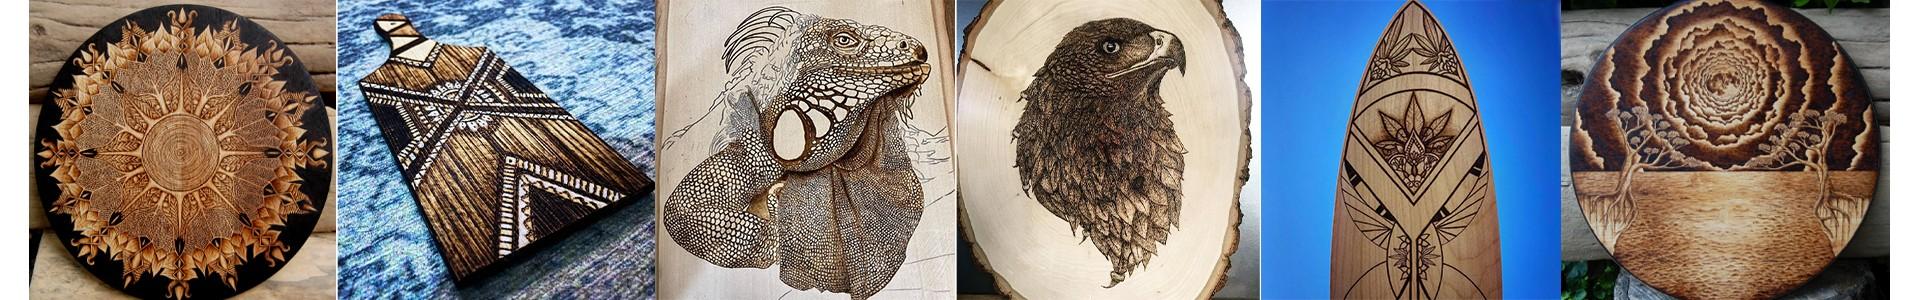 Wood burning art supplies